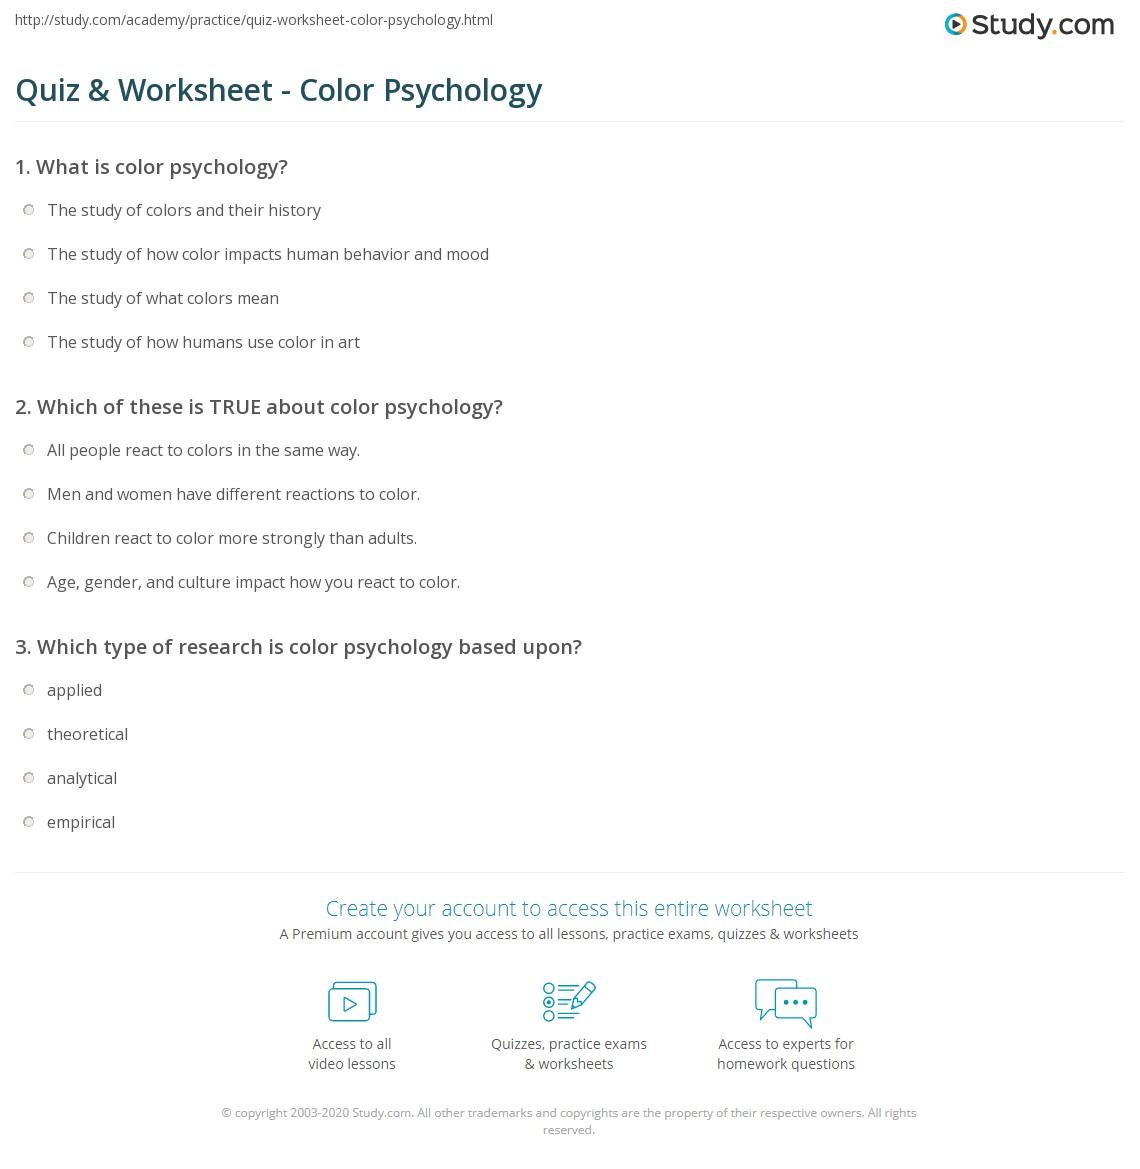 Color theory worksheet for kids - Free Preschool Color Recognition Worksheet